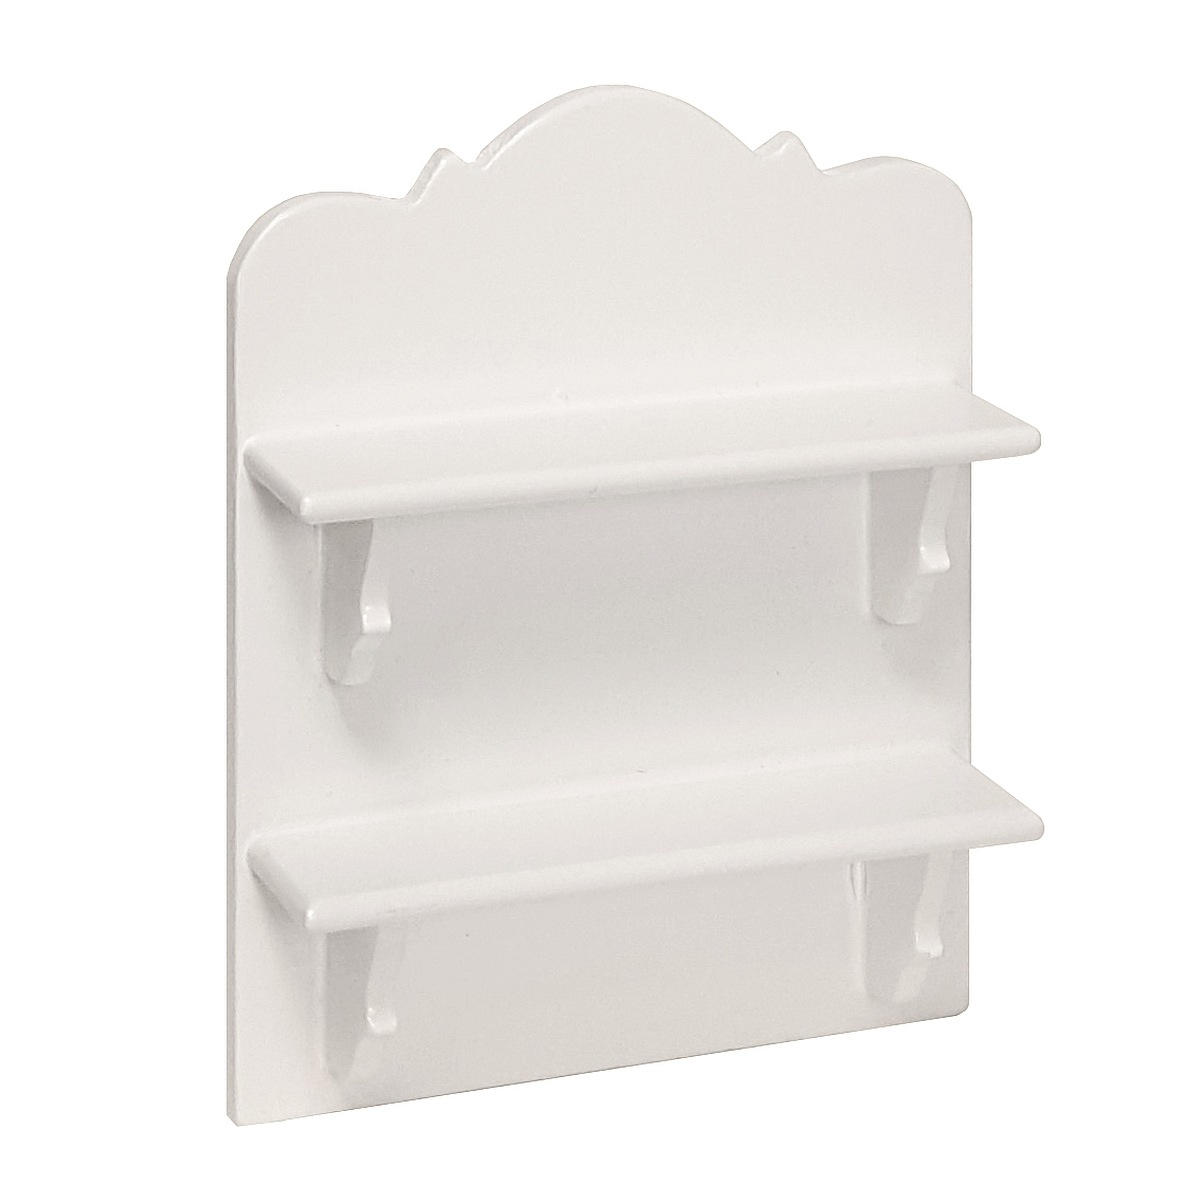 Hanging shelf, white 完成品・ハンギングシェルフ